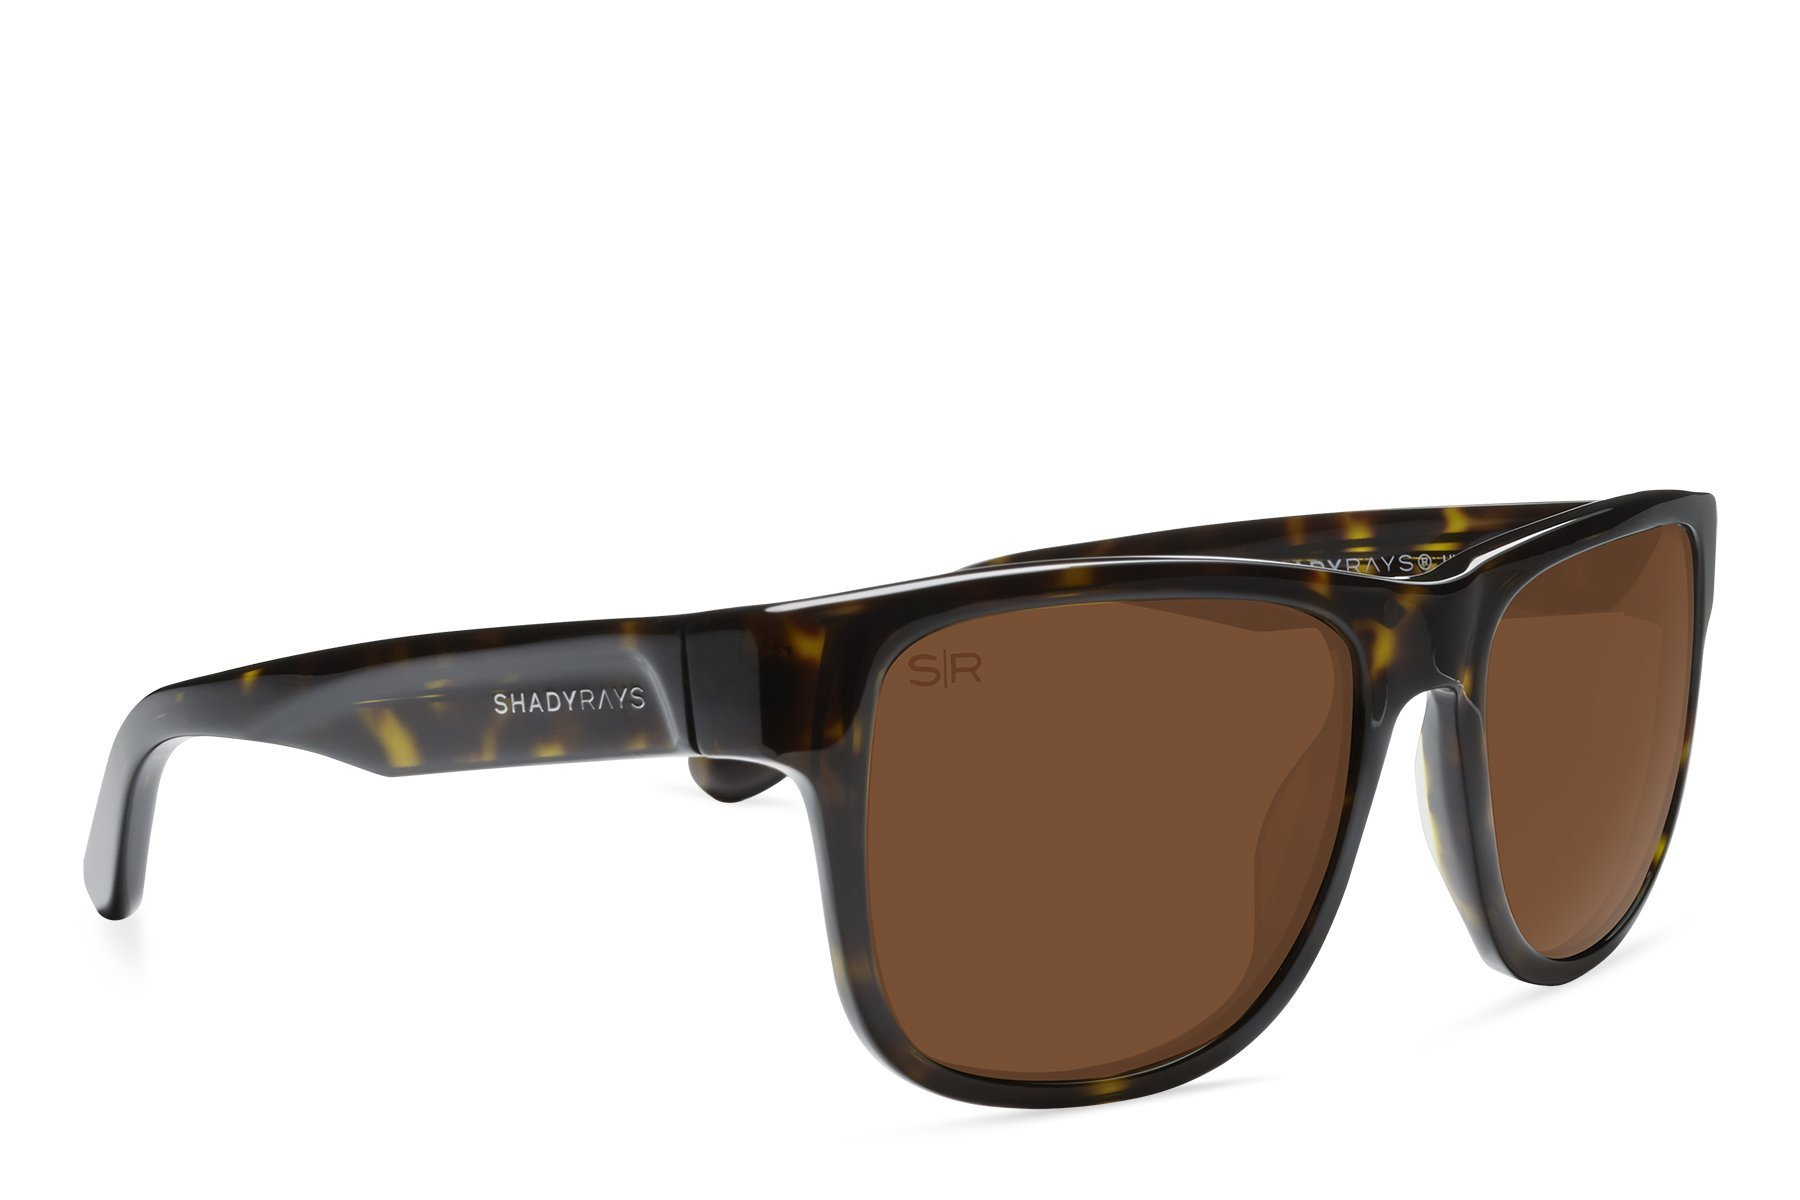 a759c325018 Shady Rays Ventura LIMITED Black Tortoise Polarized